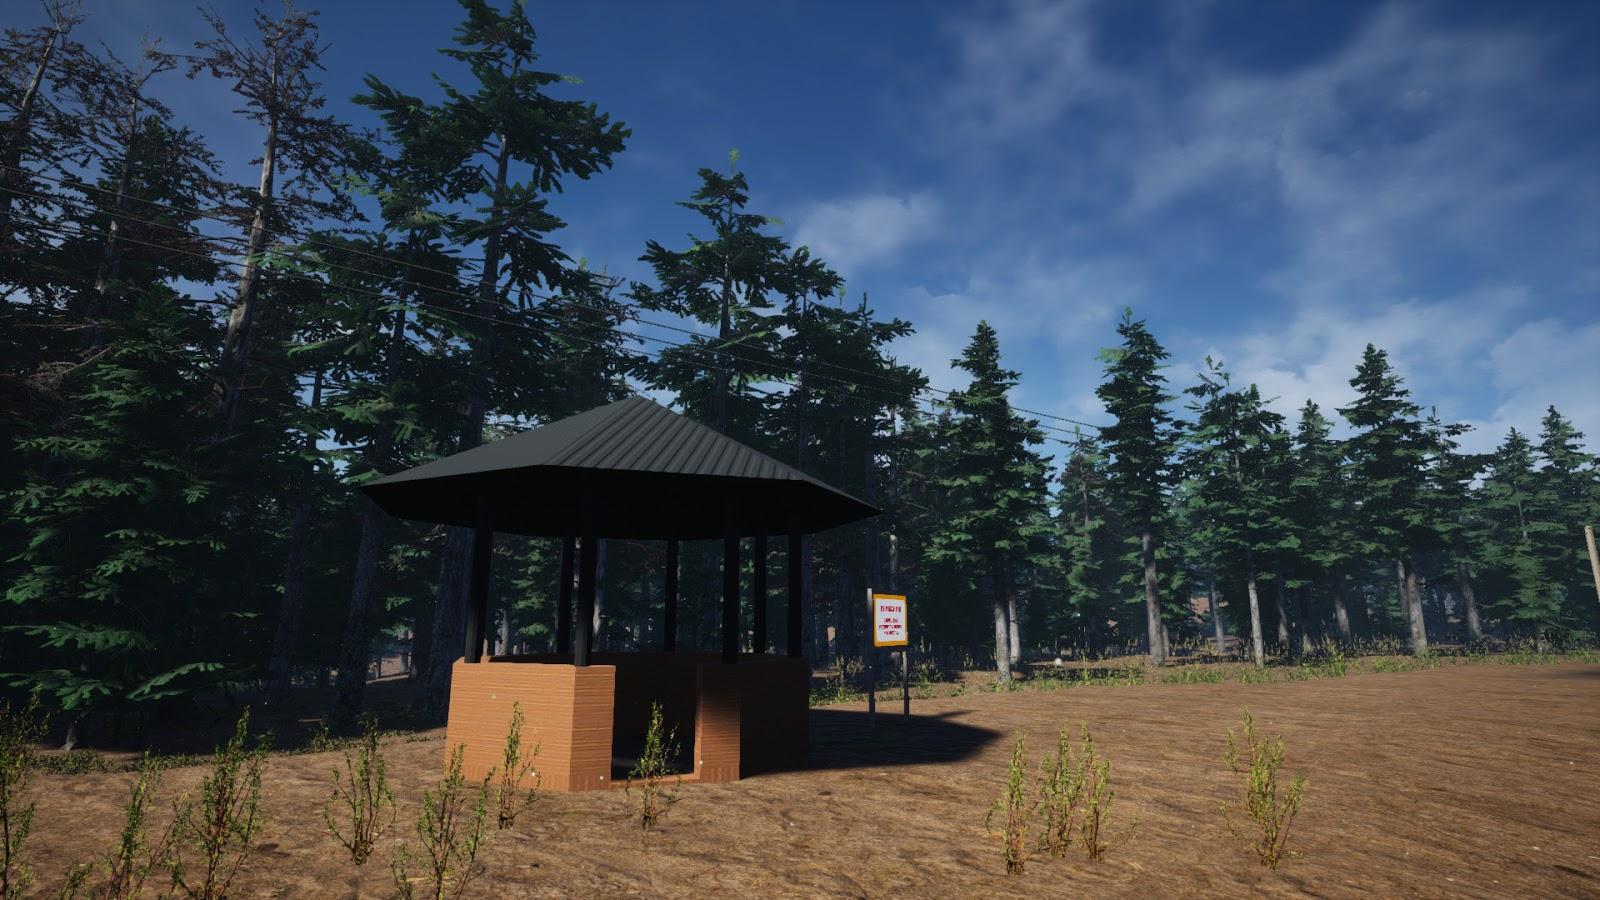 mushroom-picker-simulator-pc-screenshot-01